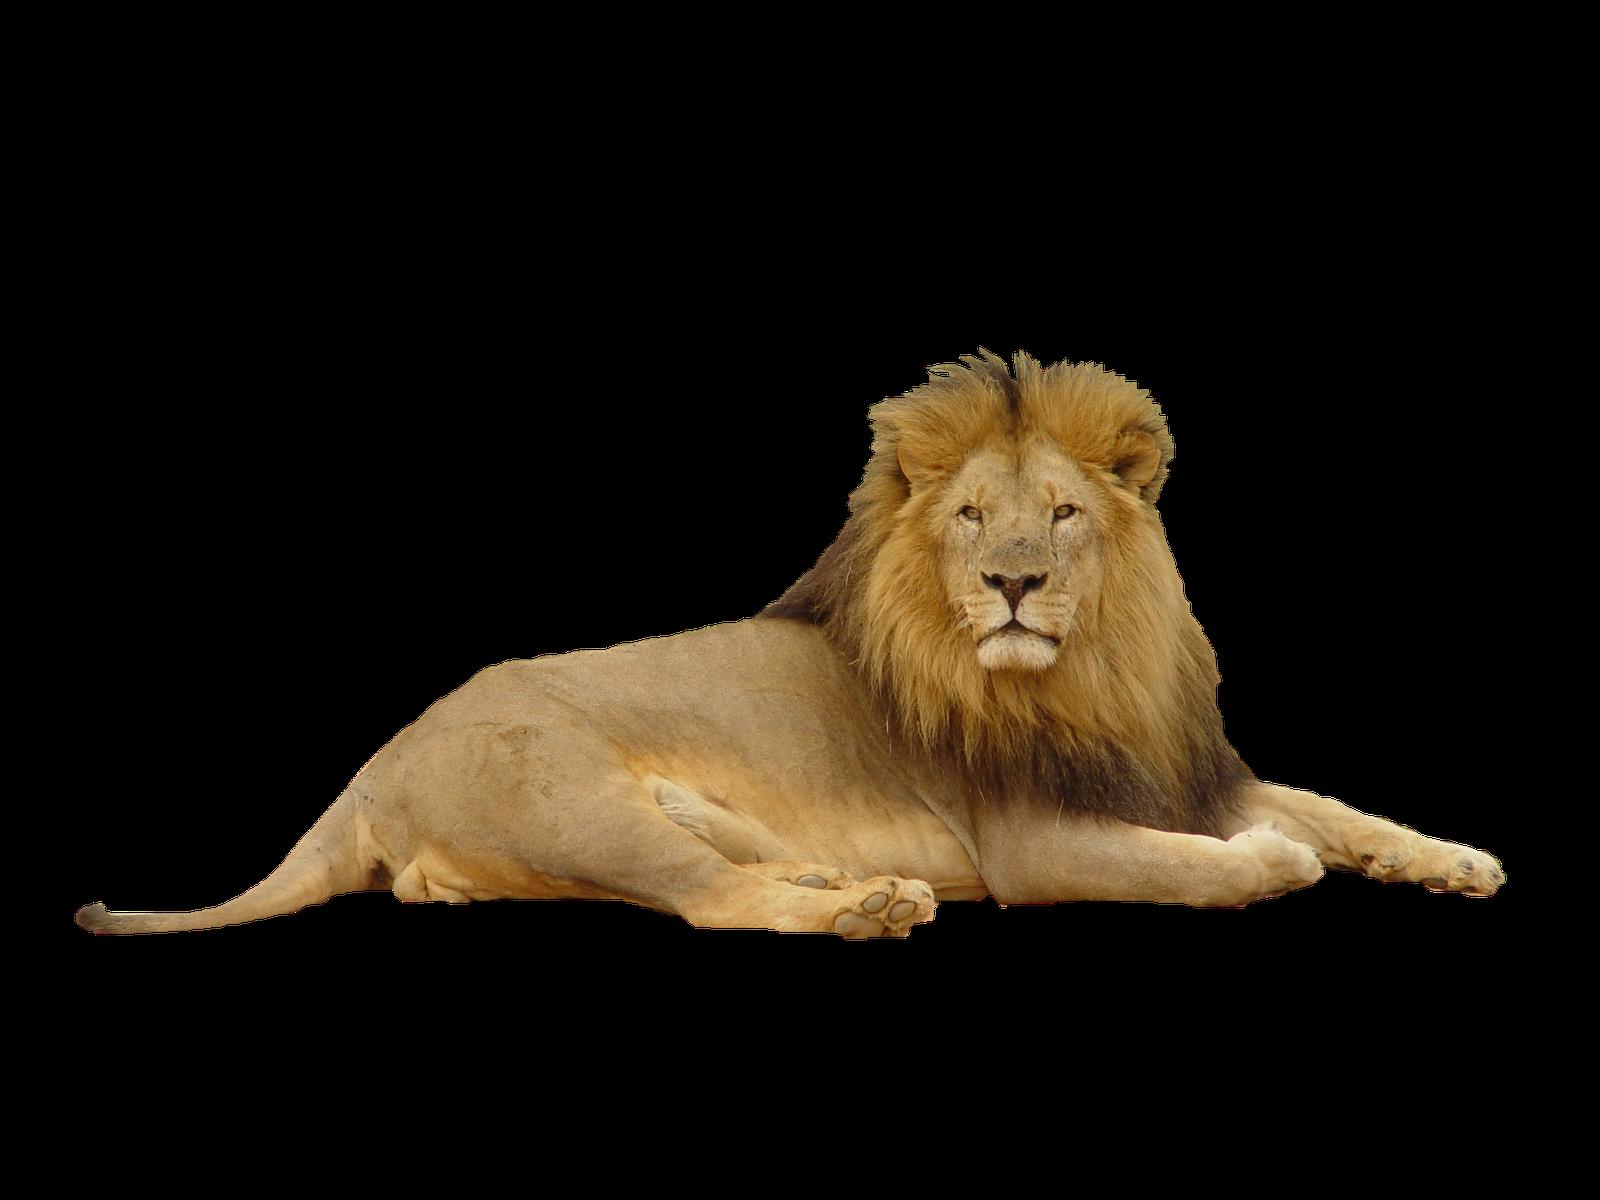 Roaring Lion Png | www.pixshark.com - Images Galleries ...